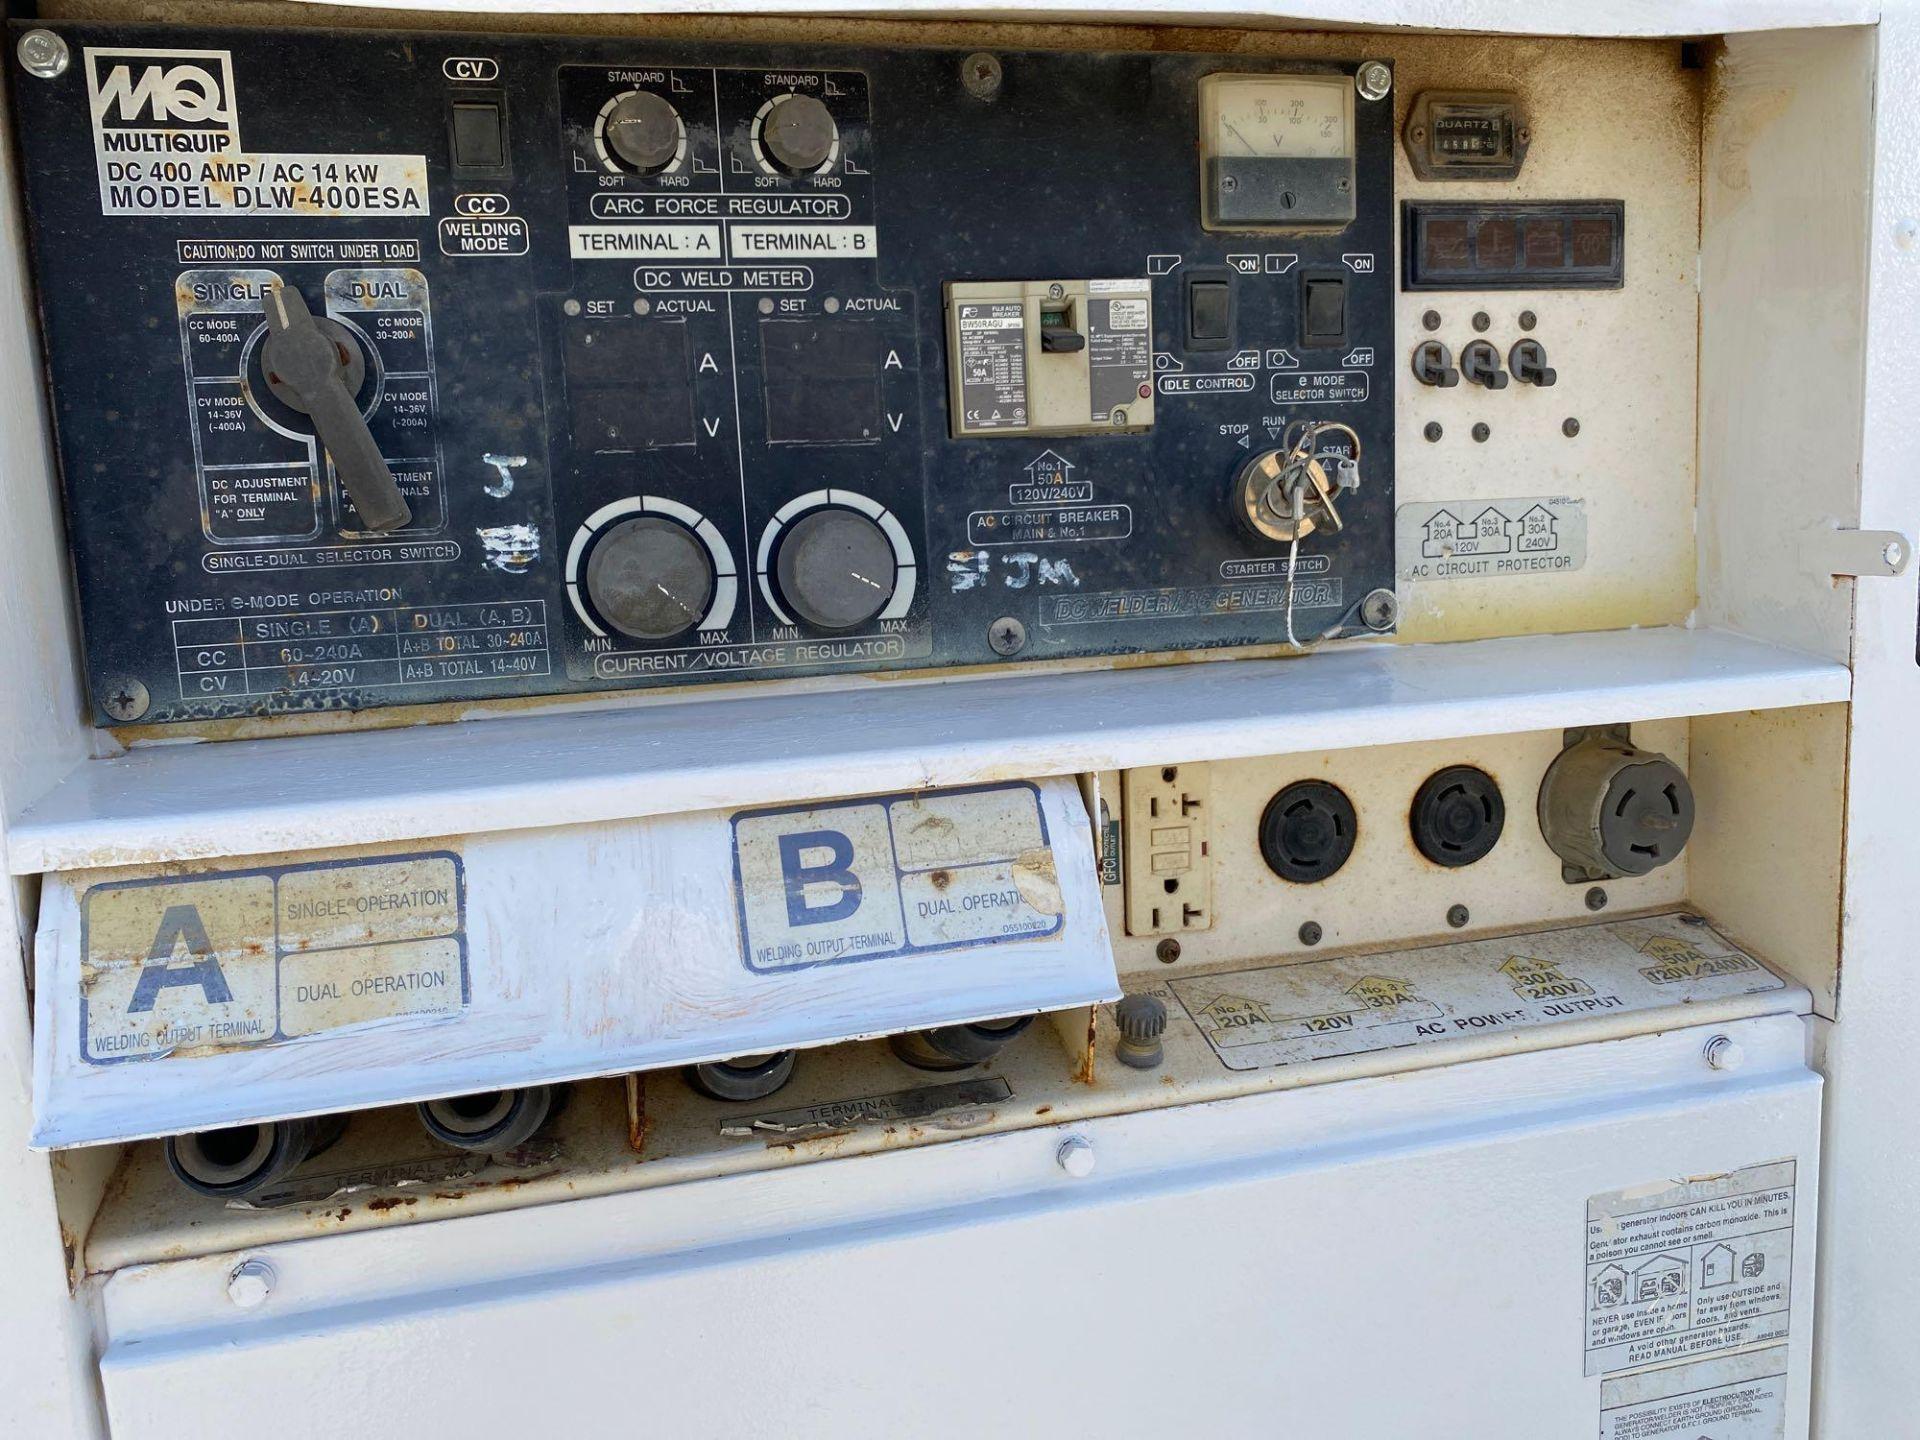 Lot 185 - WHISPERWELD 400 AMP DC WELDER/14 KW GENERATOR, MODEL DLW-400 ESA, TRAILER MOUNTED, RUNS AND OPERATES